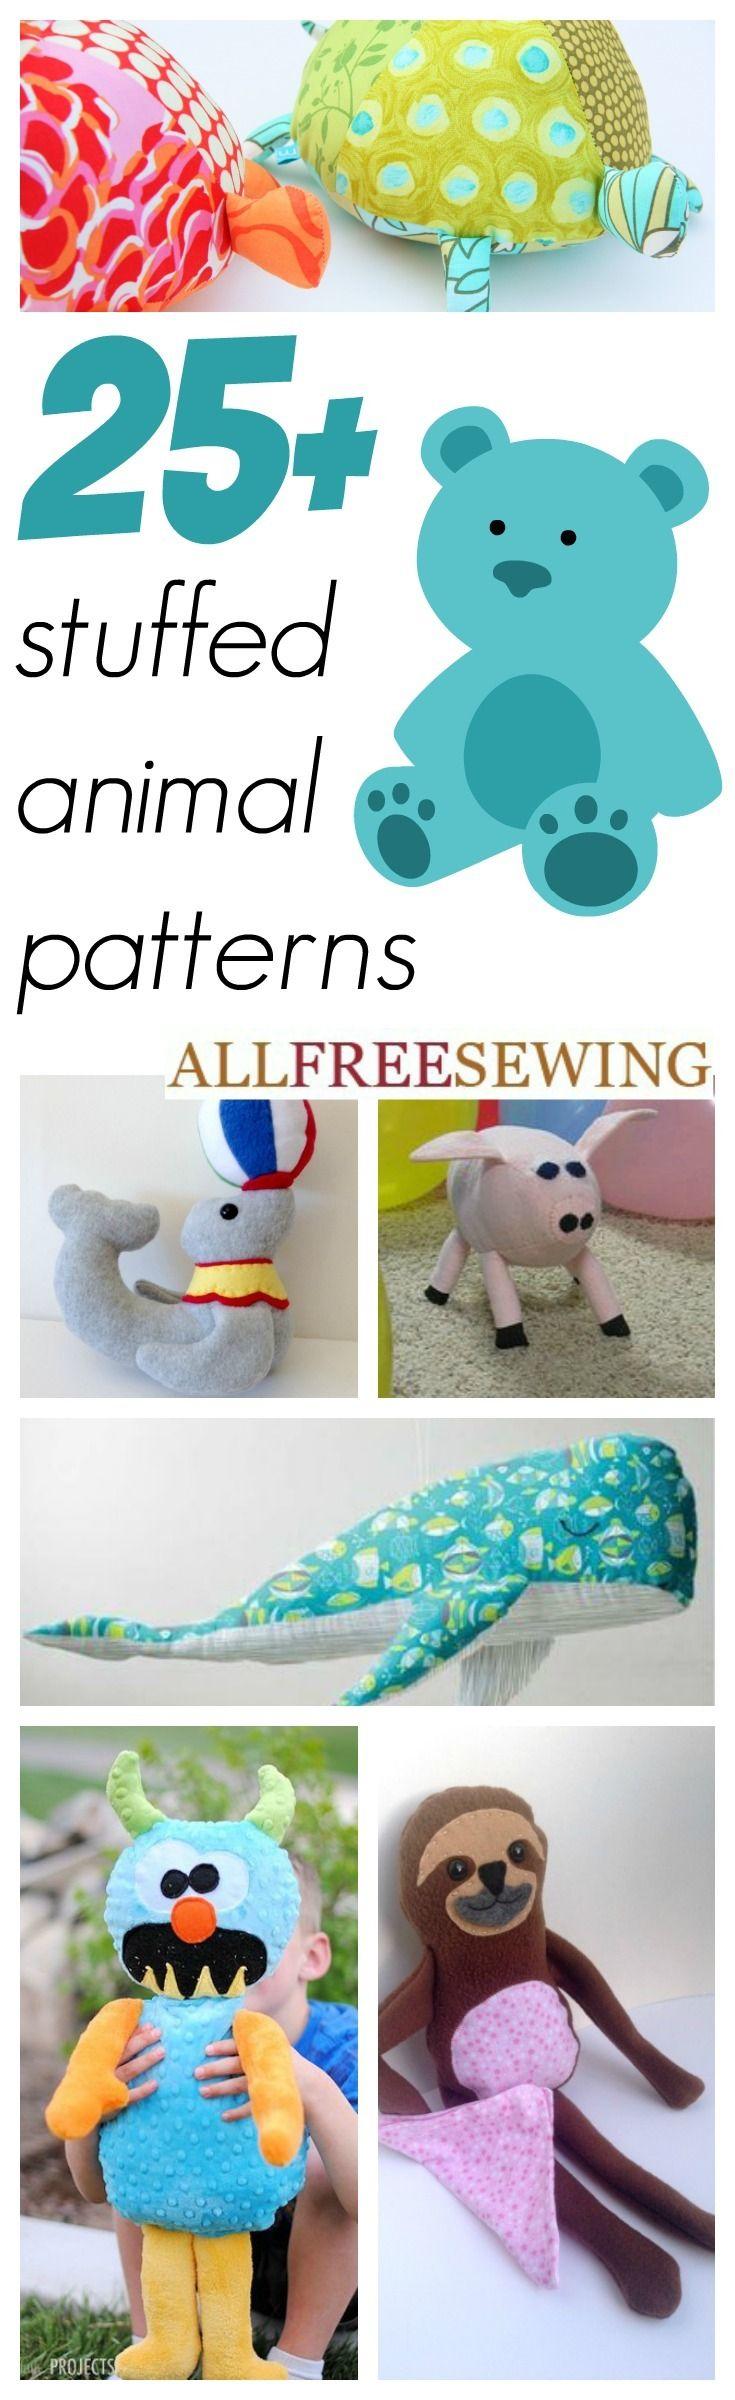 Stuffed animal pattern Mas de 25 patrones de animales de peluche   -   25+ Easy Stuffed Animal Patterns